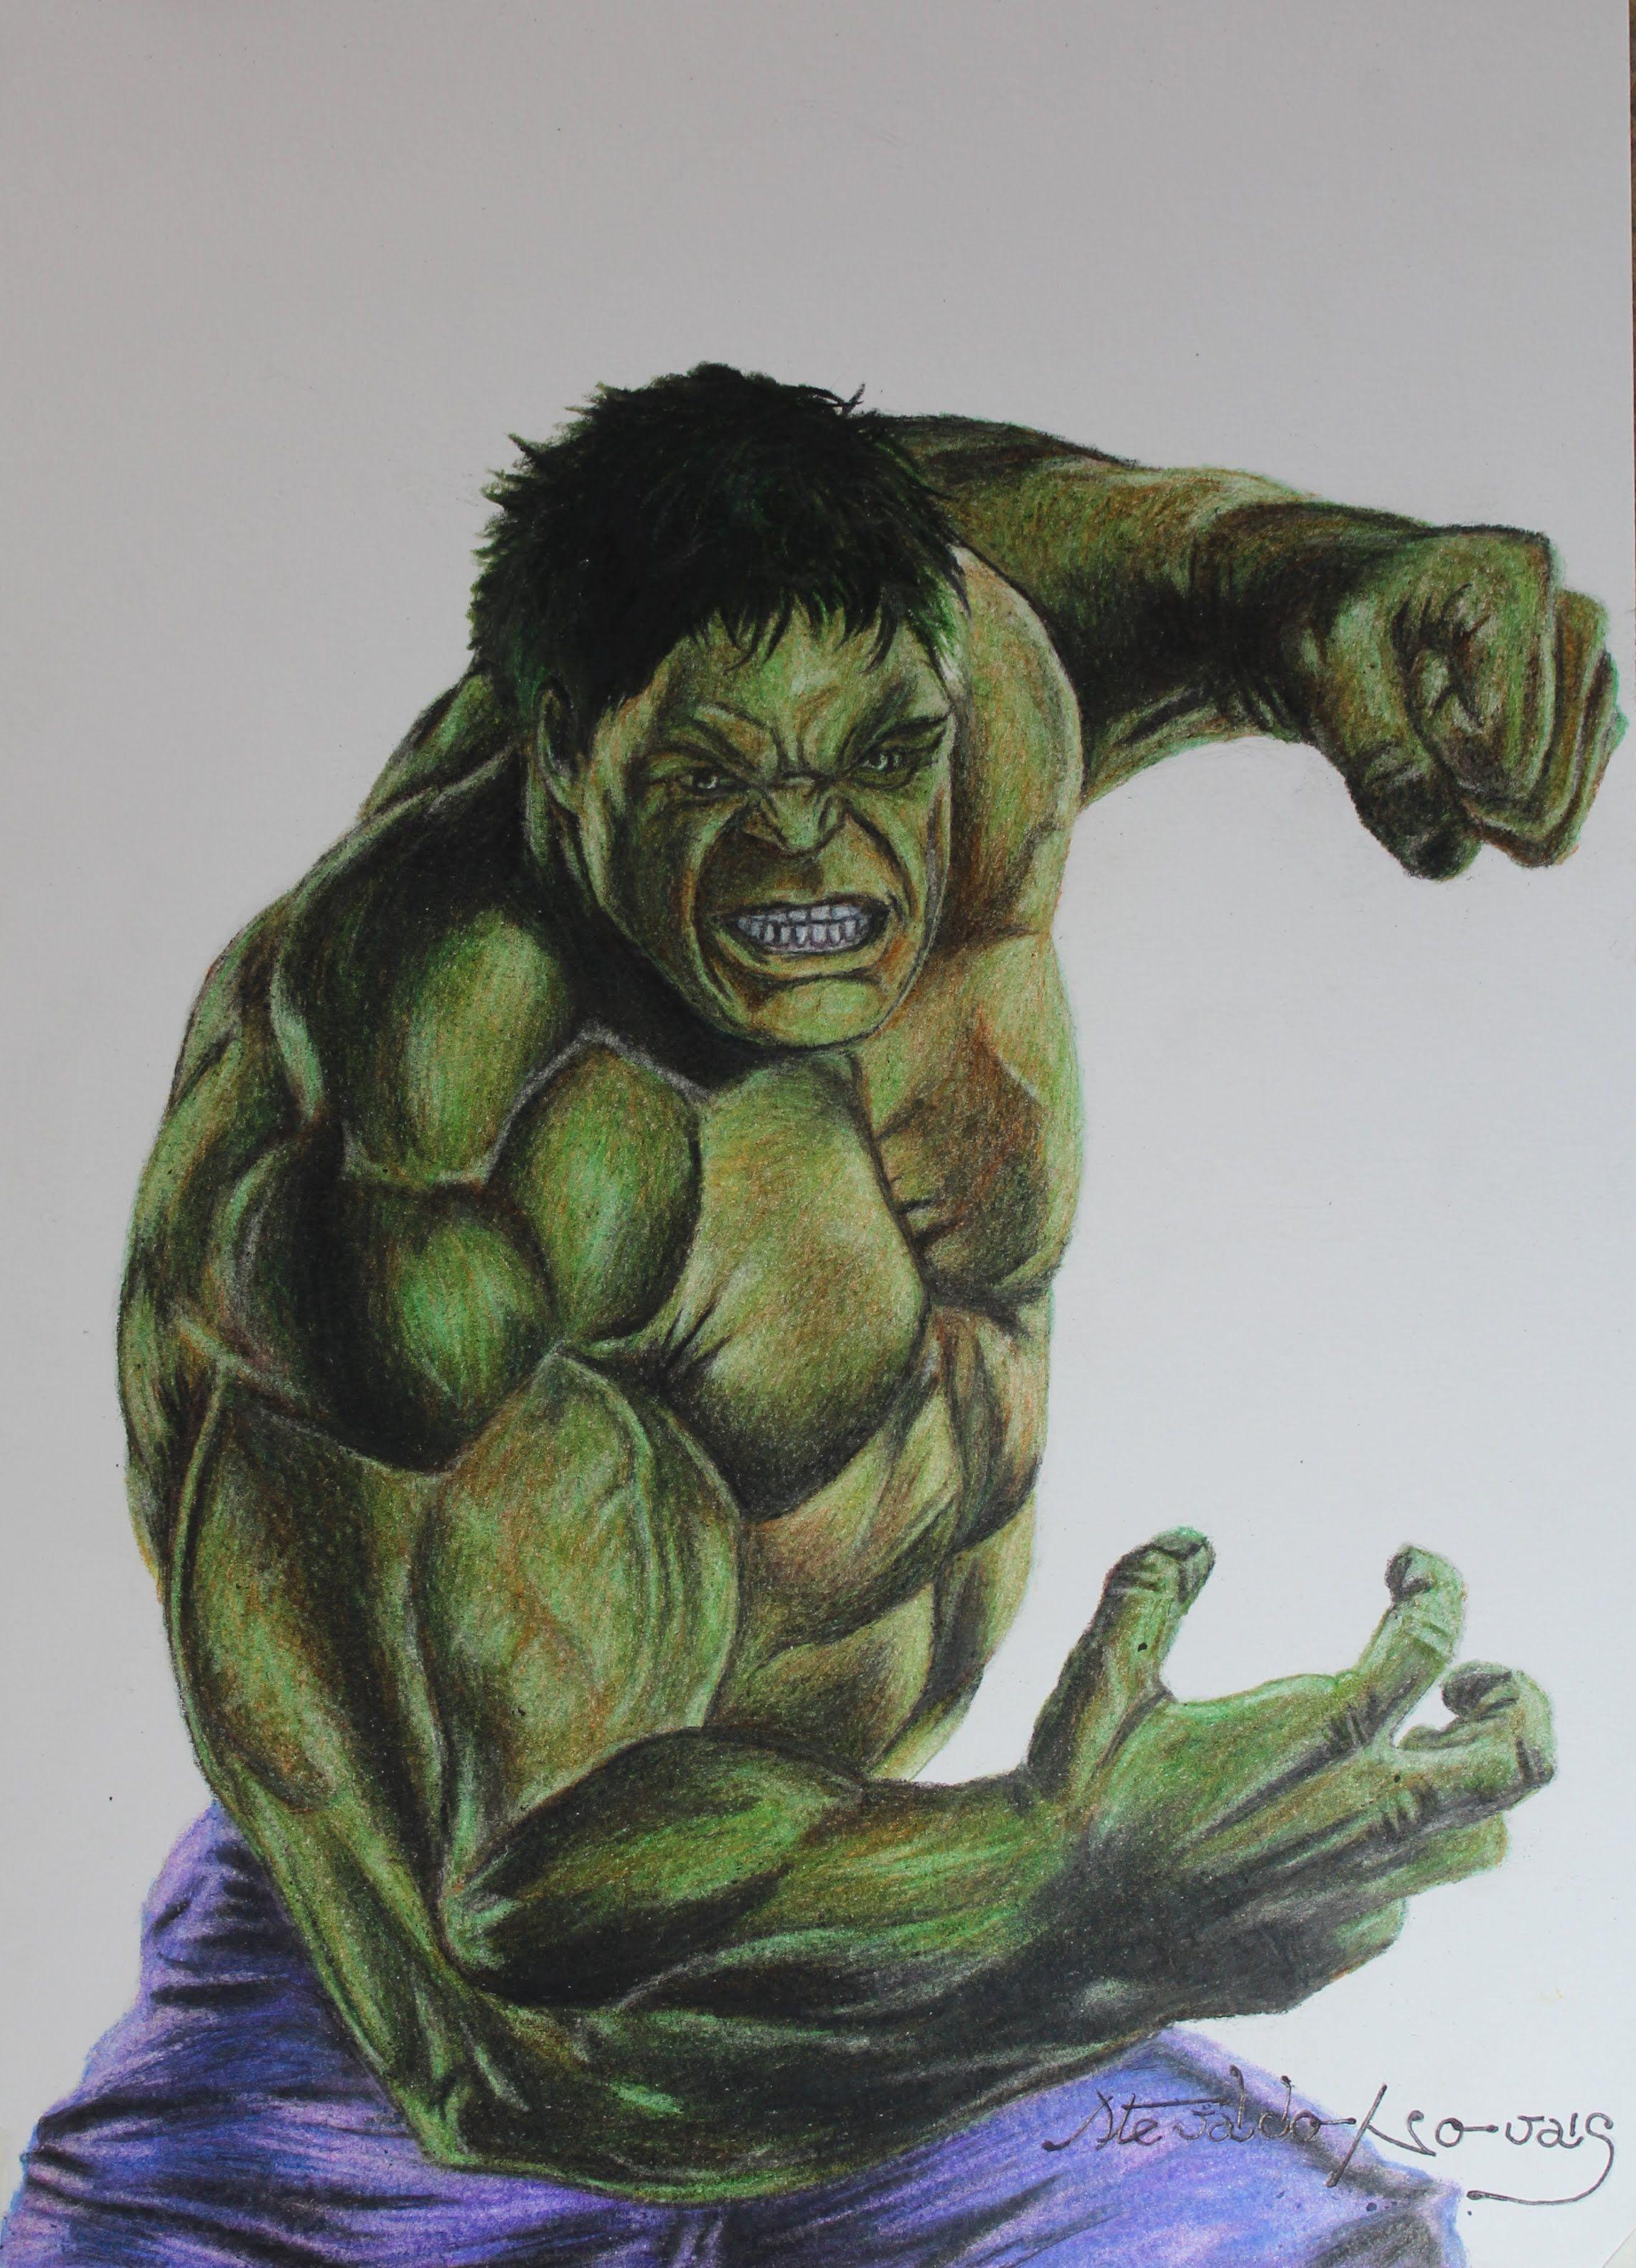 Incrivel Hulck Minimalist drawing incredible hulk i desenhando o incrível hulk   art